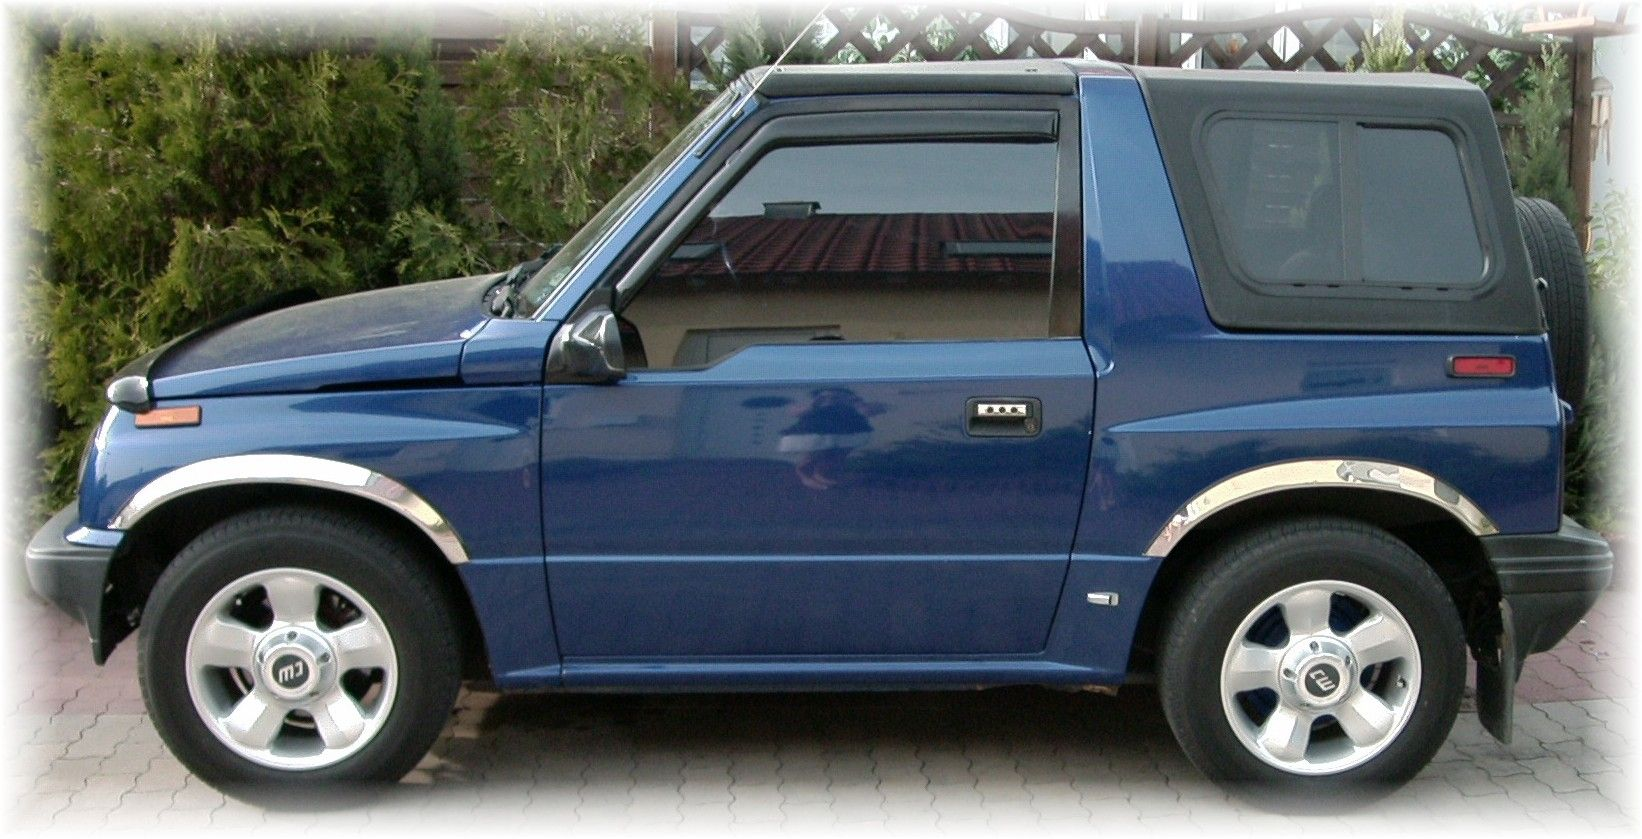 Blue Geo Tracker Camiones Autos